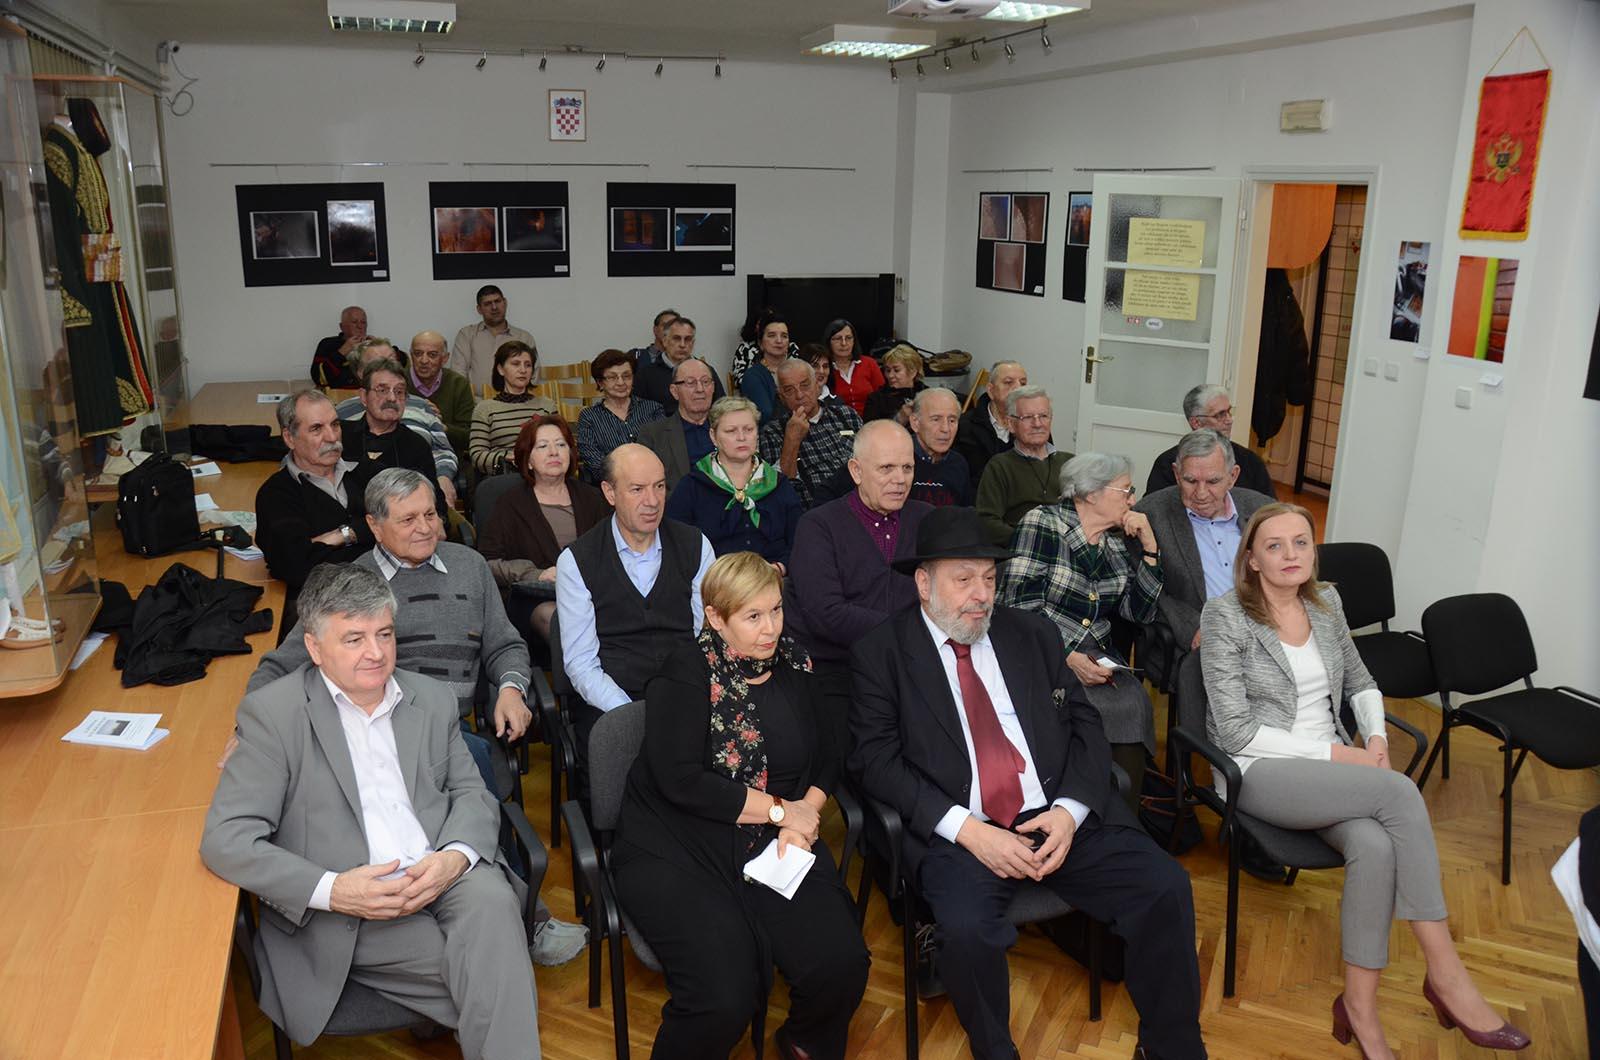 Projekcija Filma U Klubu Crnogoraca 7 3